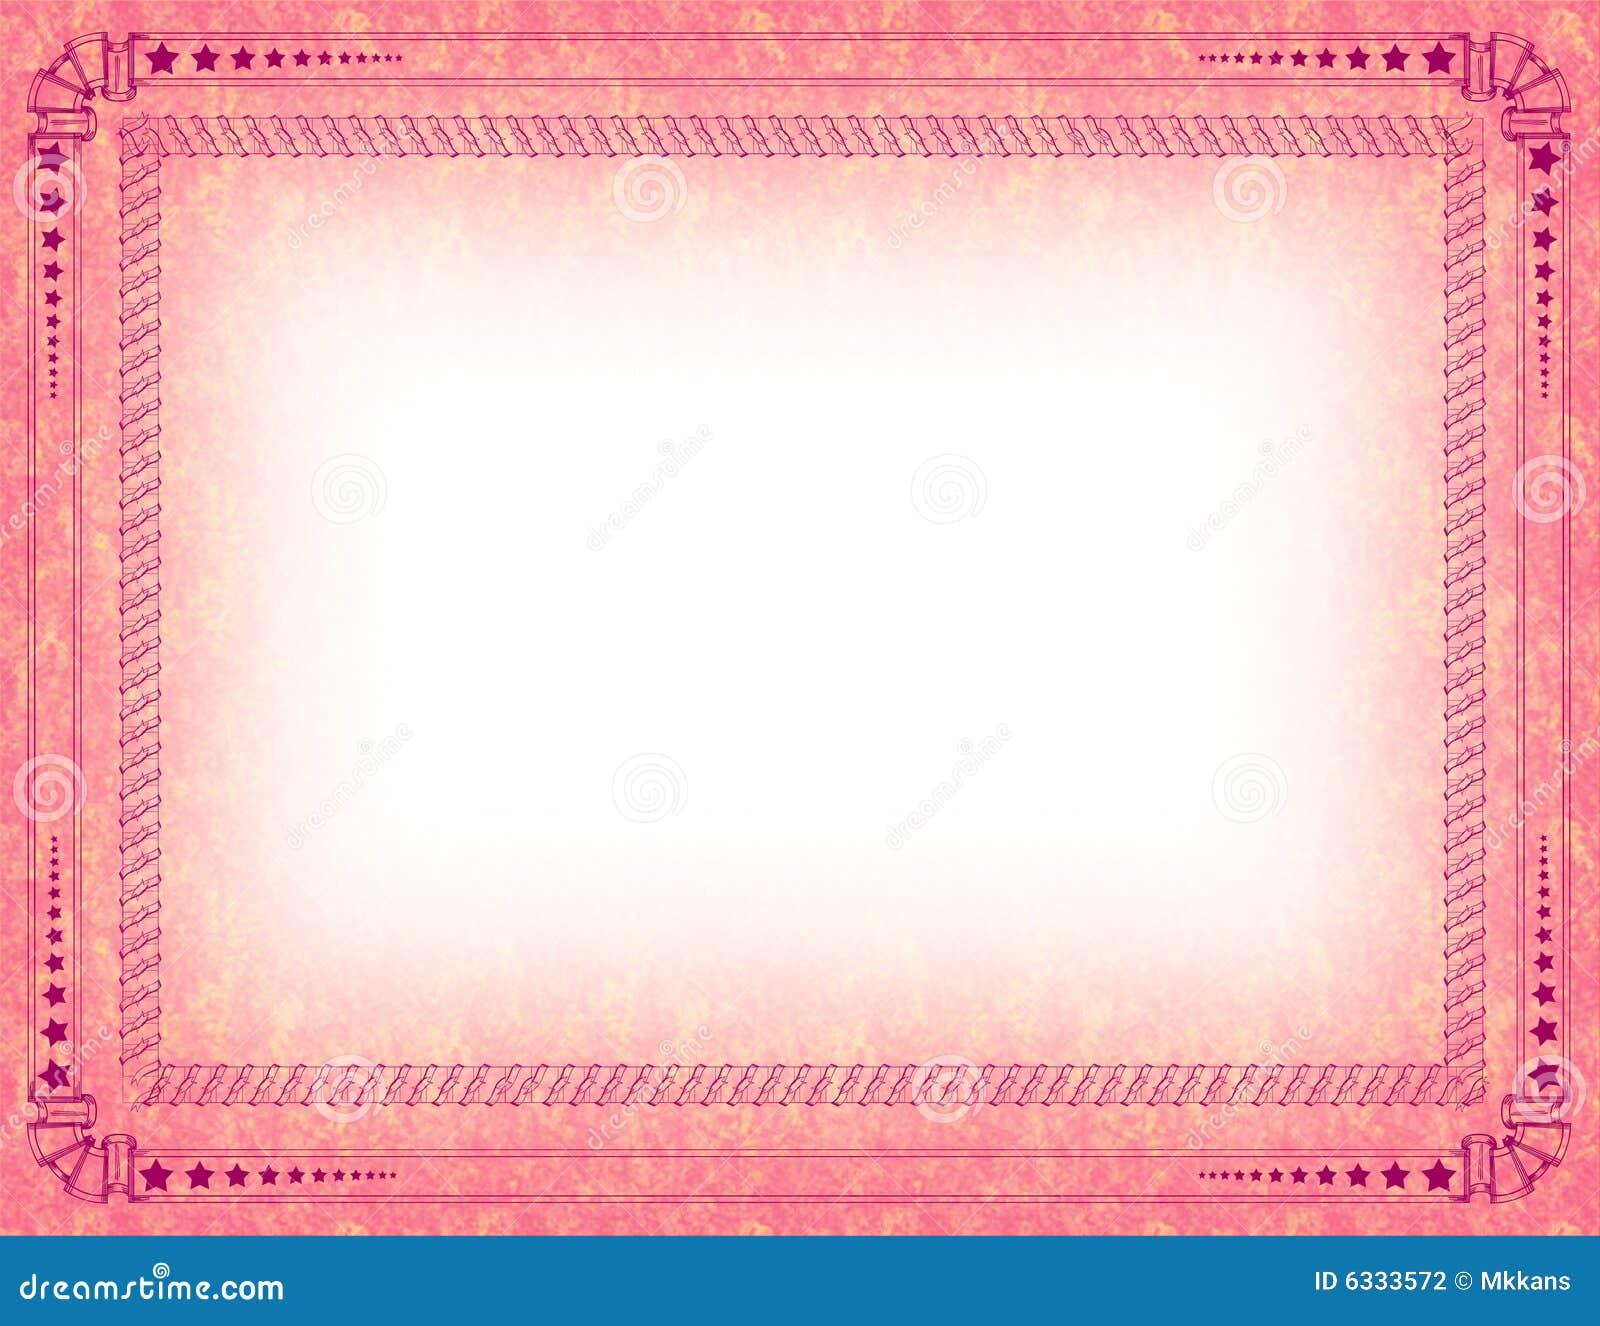 Christian Certificate Template